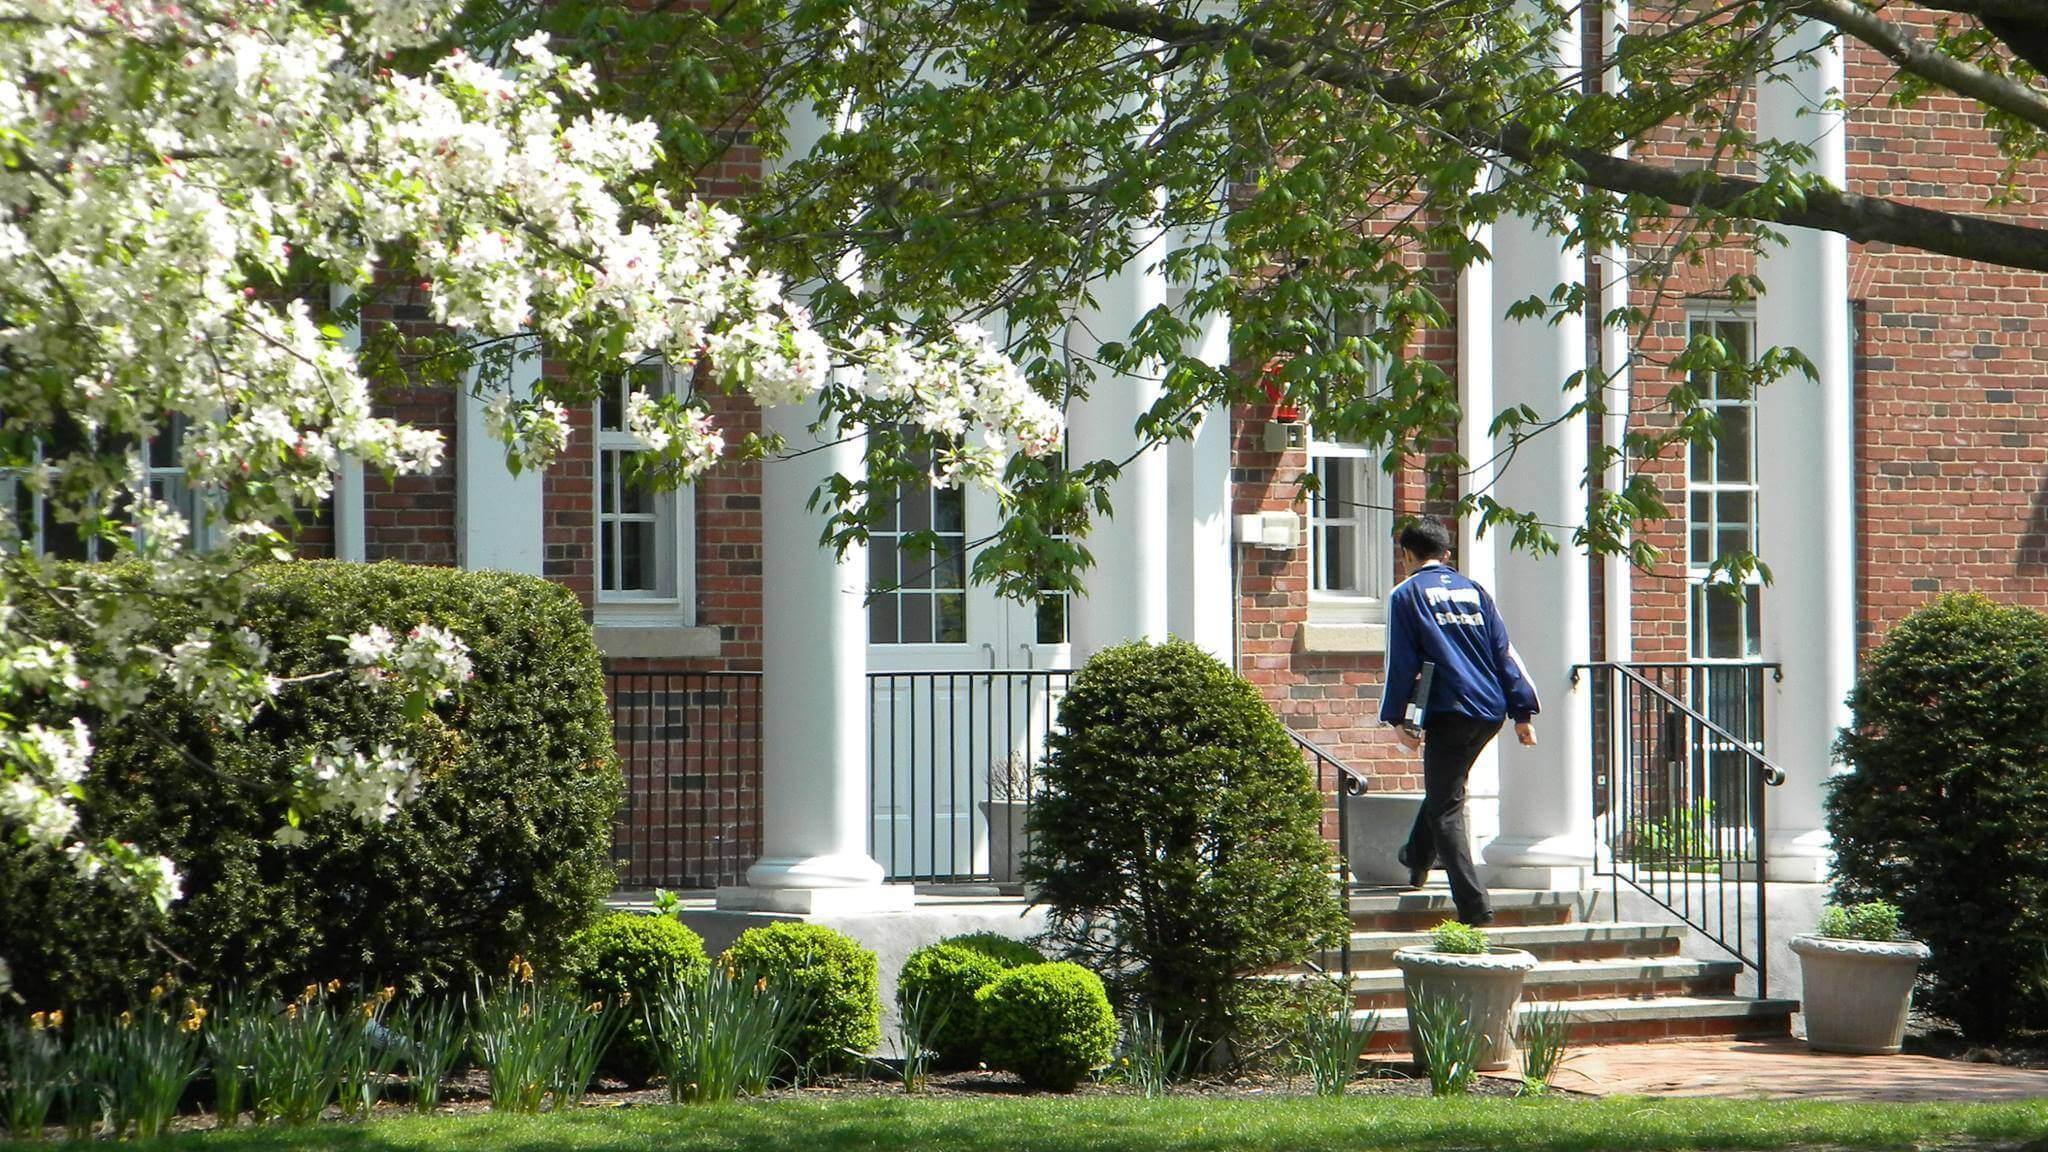 The Stony Brook School - United States Boarding Schools